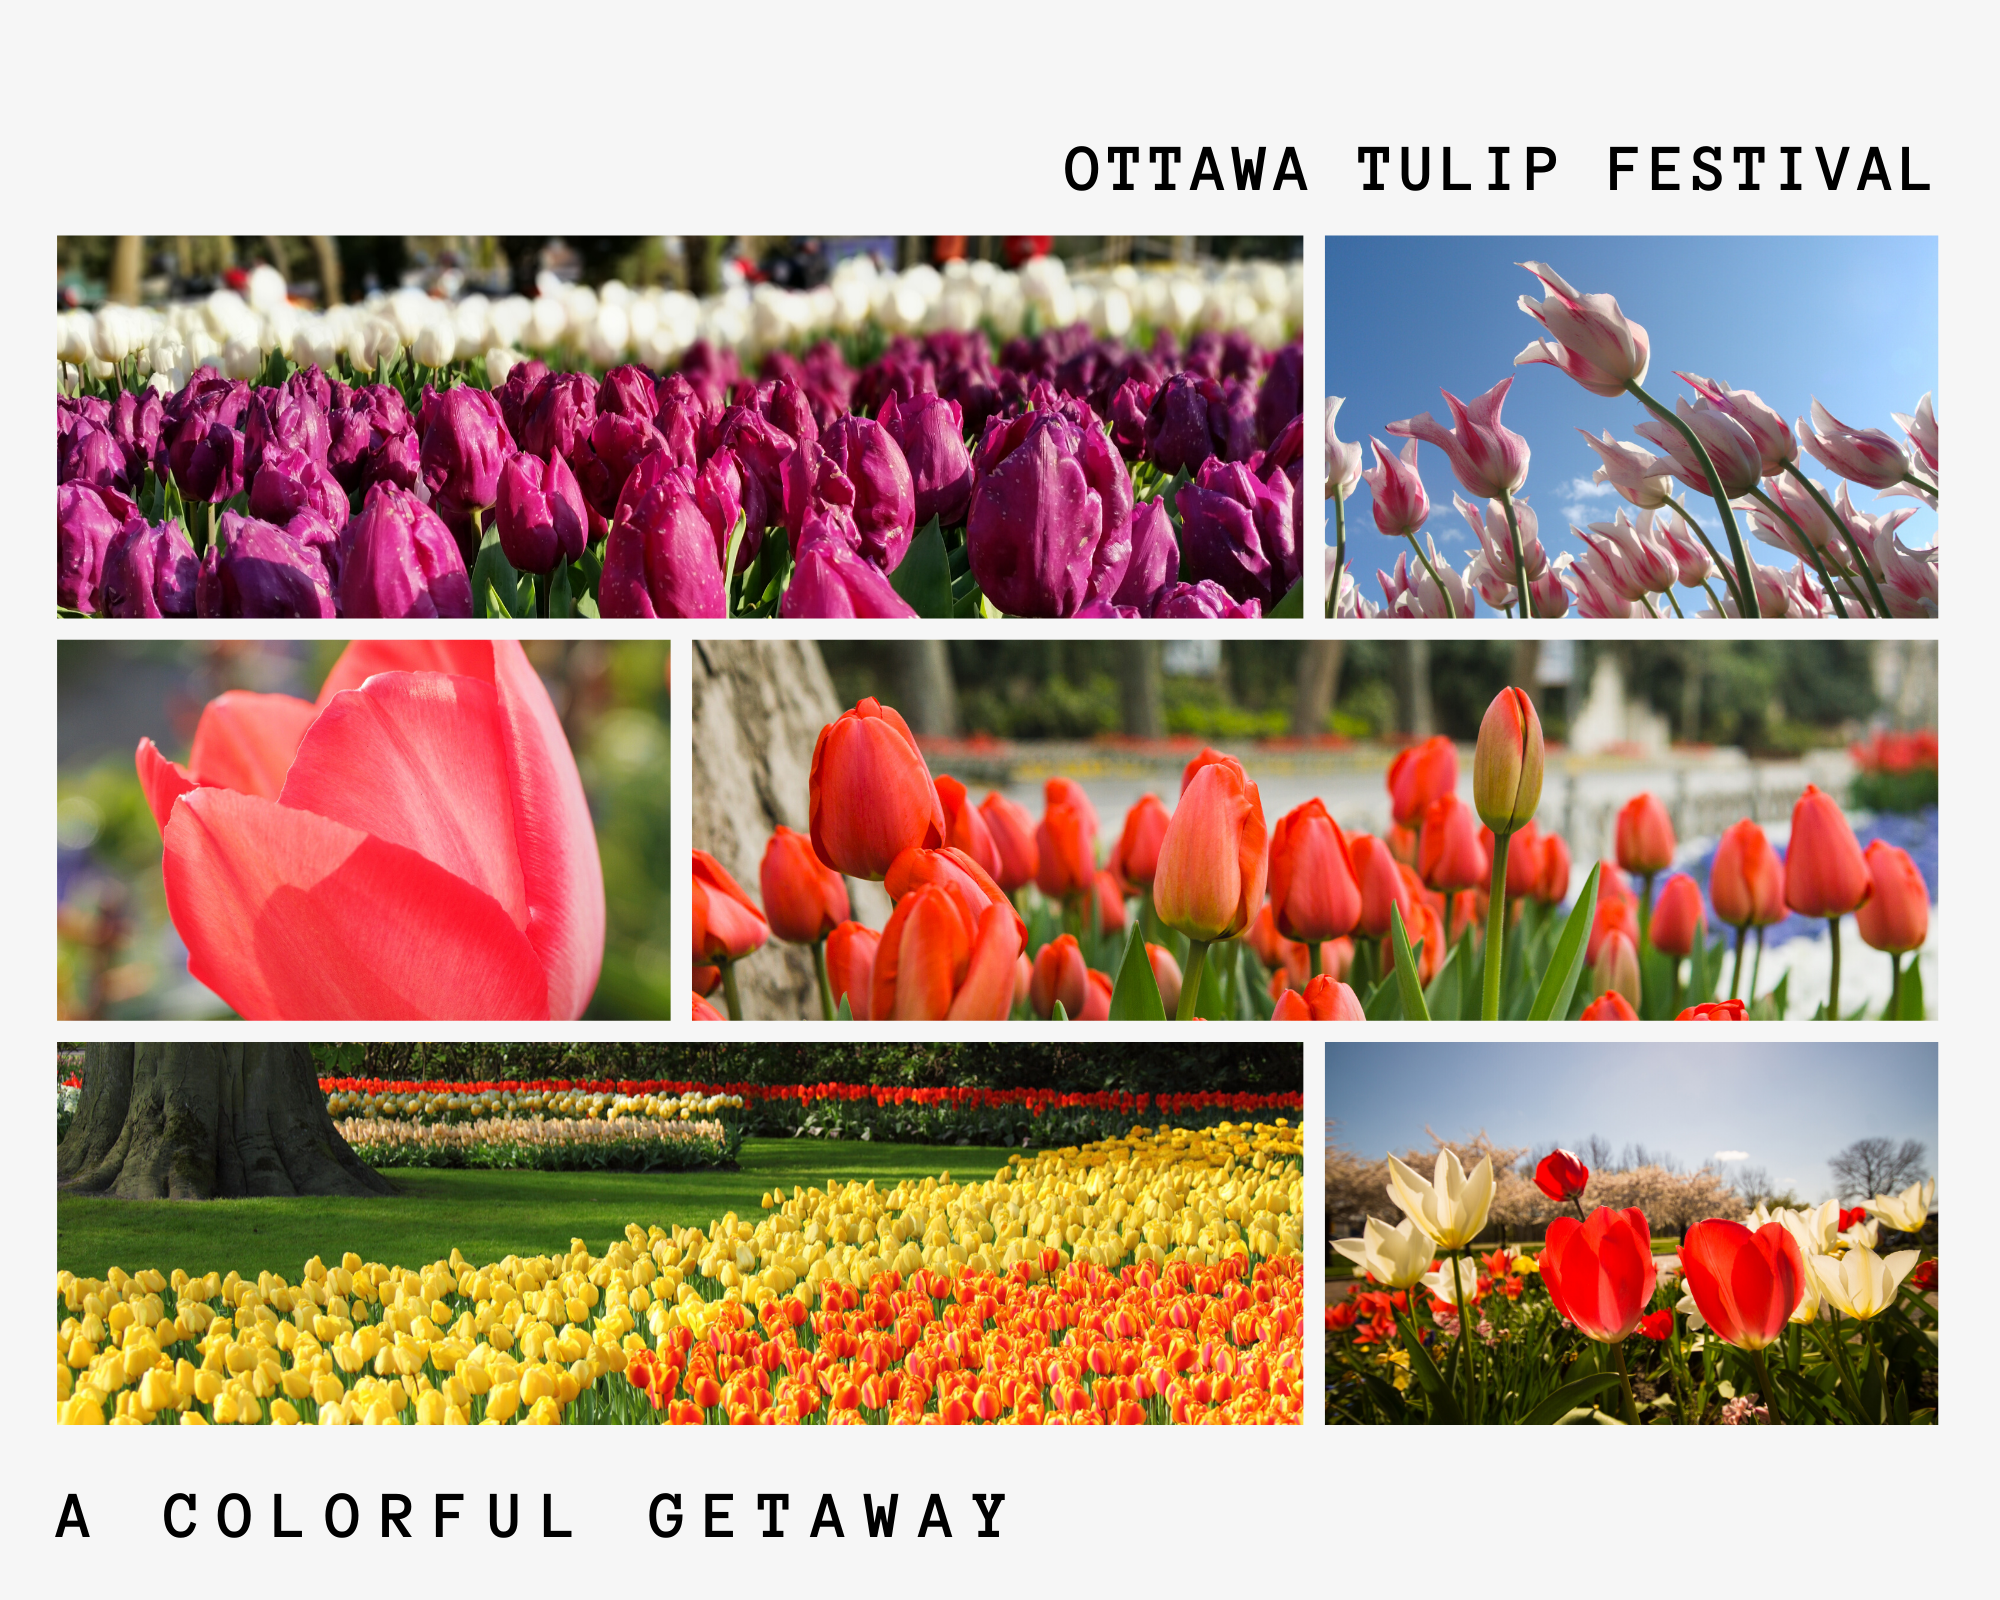 Canadian Tulip Festival in Ottawa